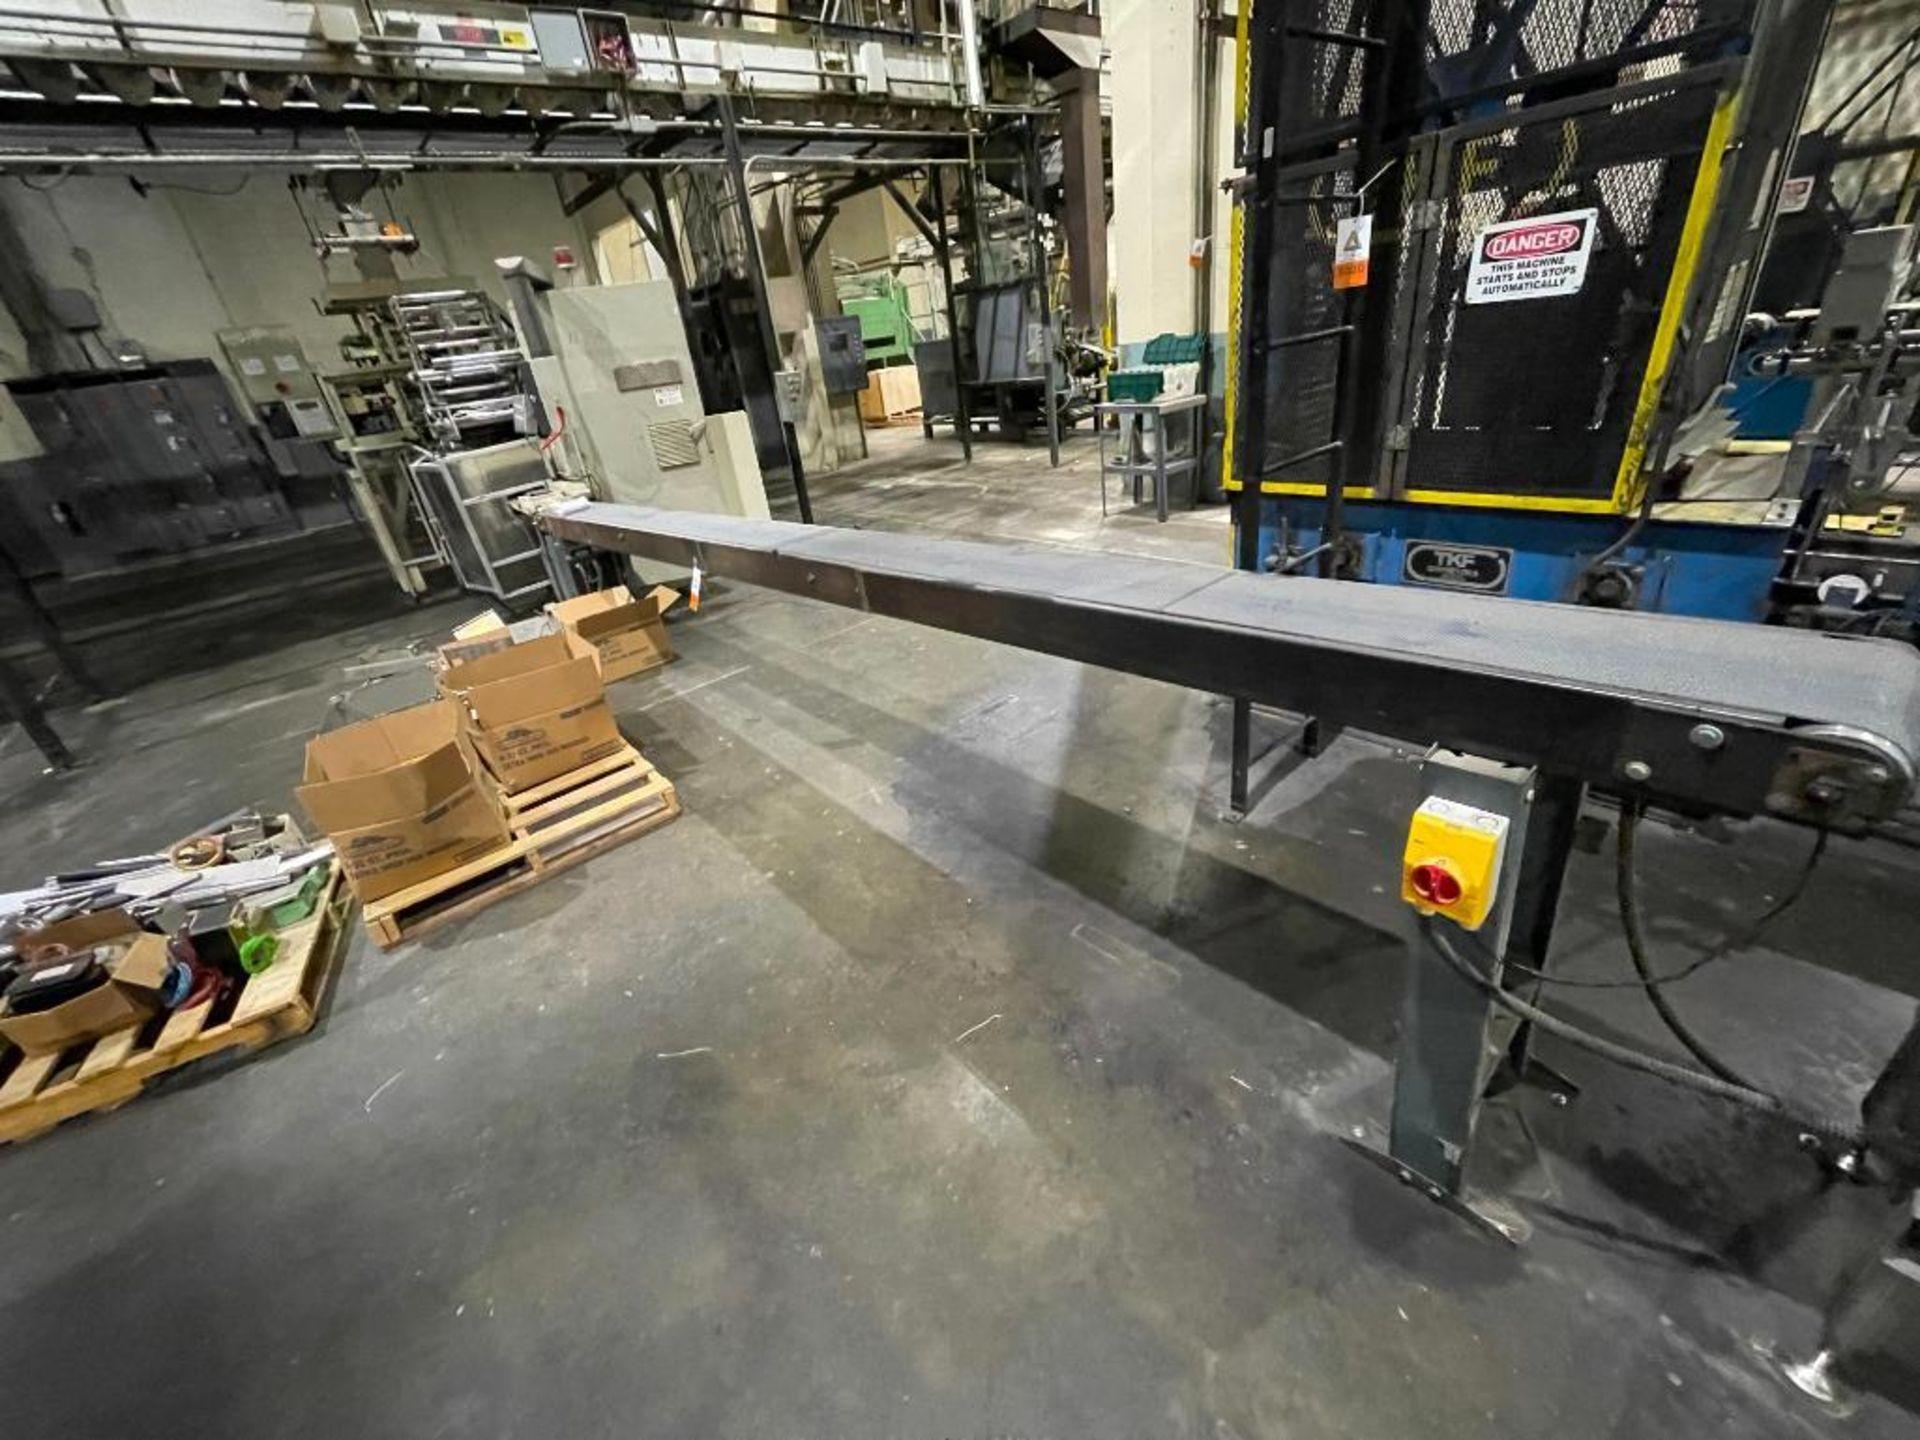 rubber belt conveyor - Image 3 of 7